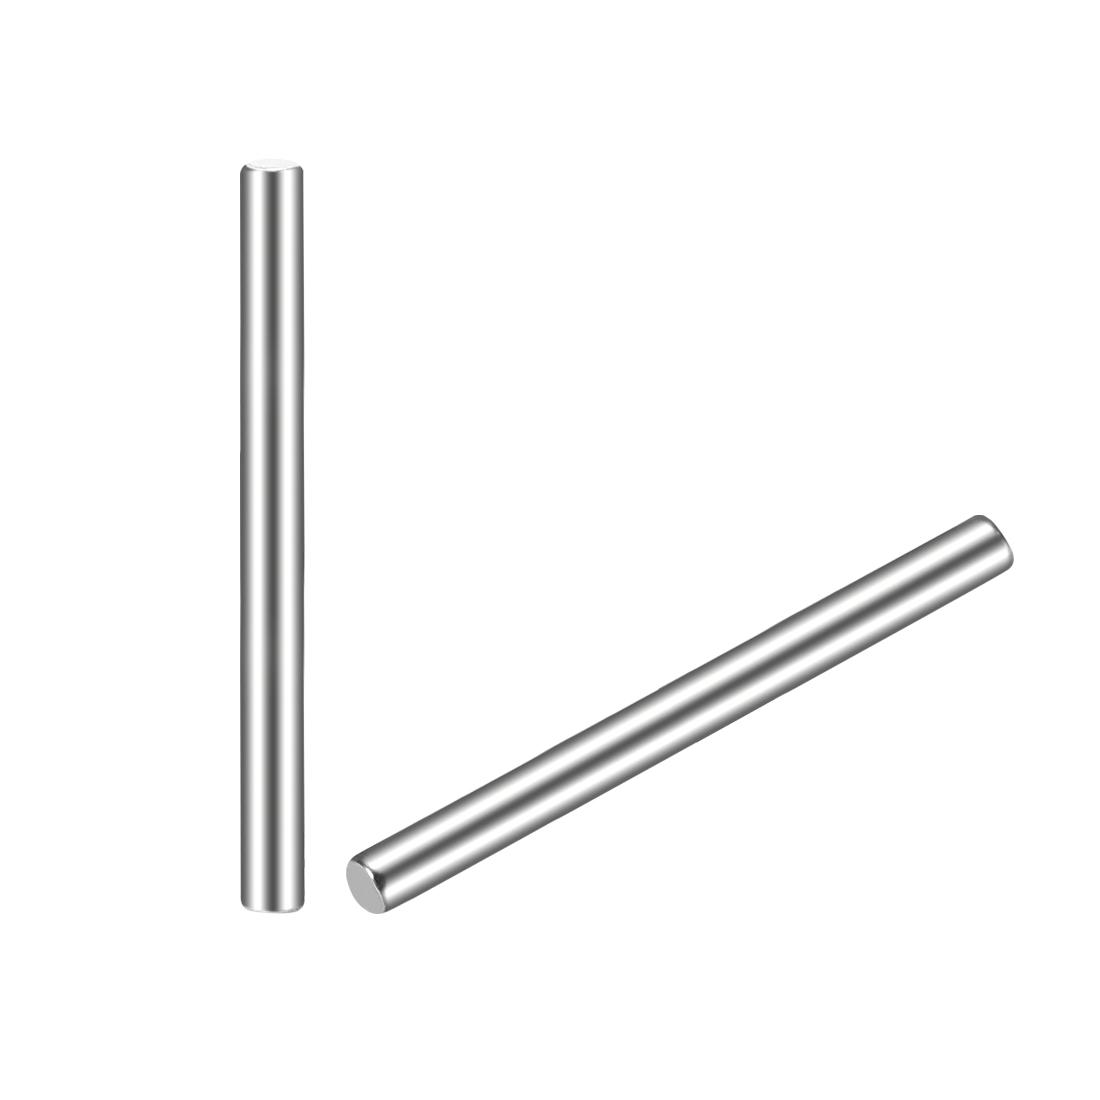 20Pcs 2mm x 25mm Dowel Pin 304 Stainless Steel Shelf Support Pin Fasten